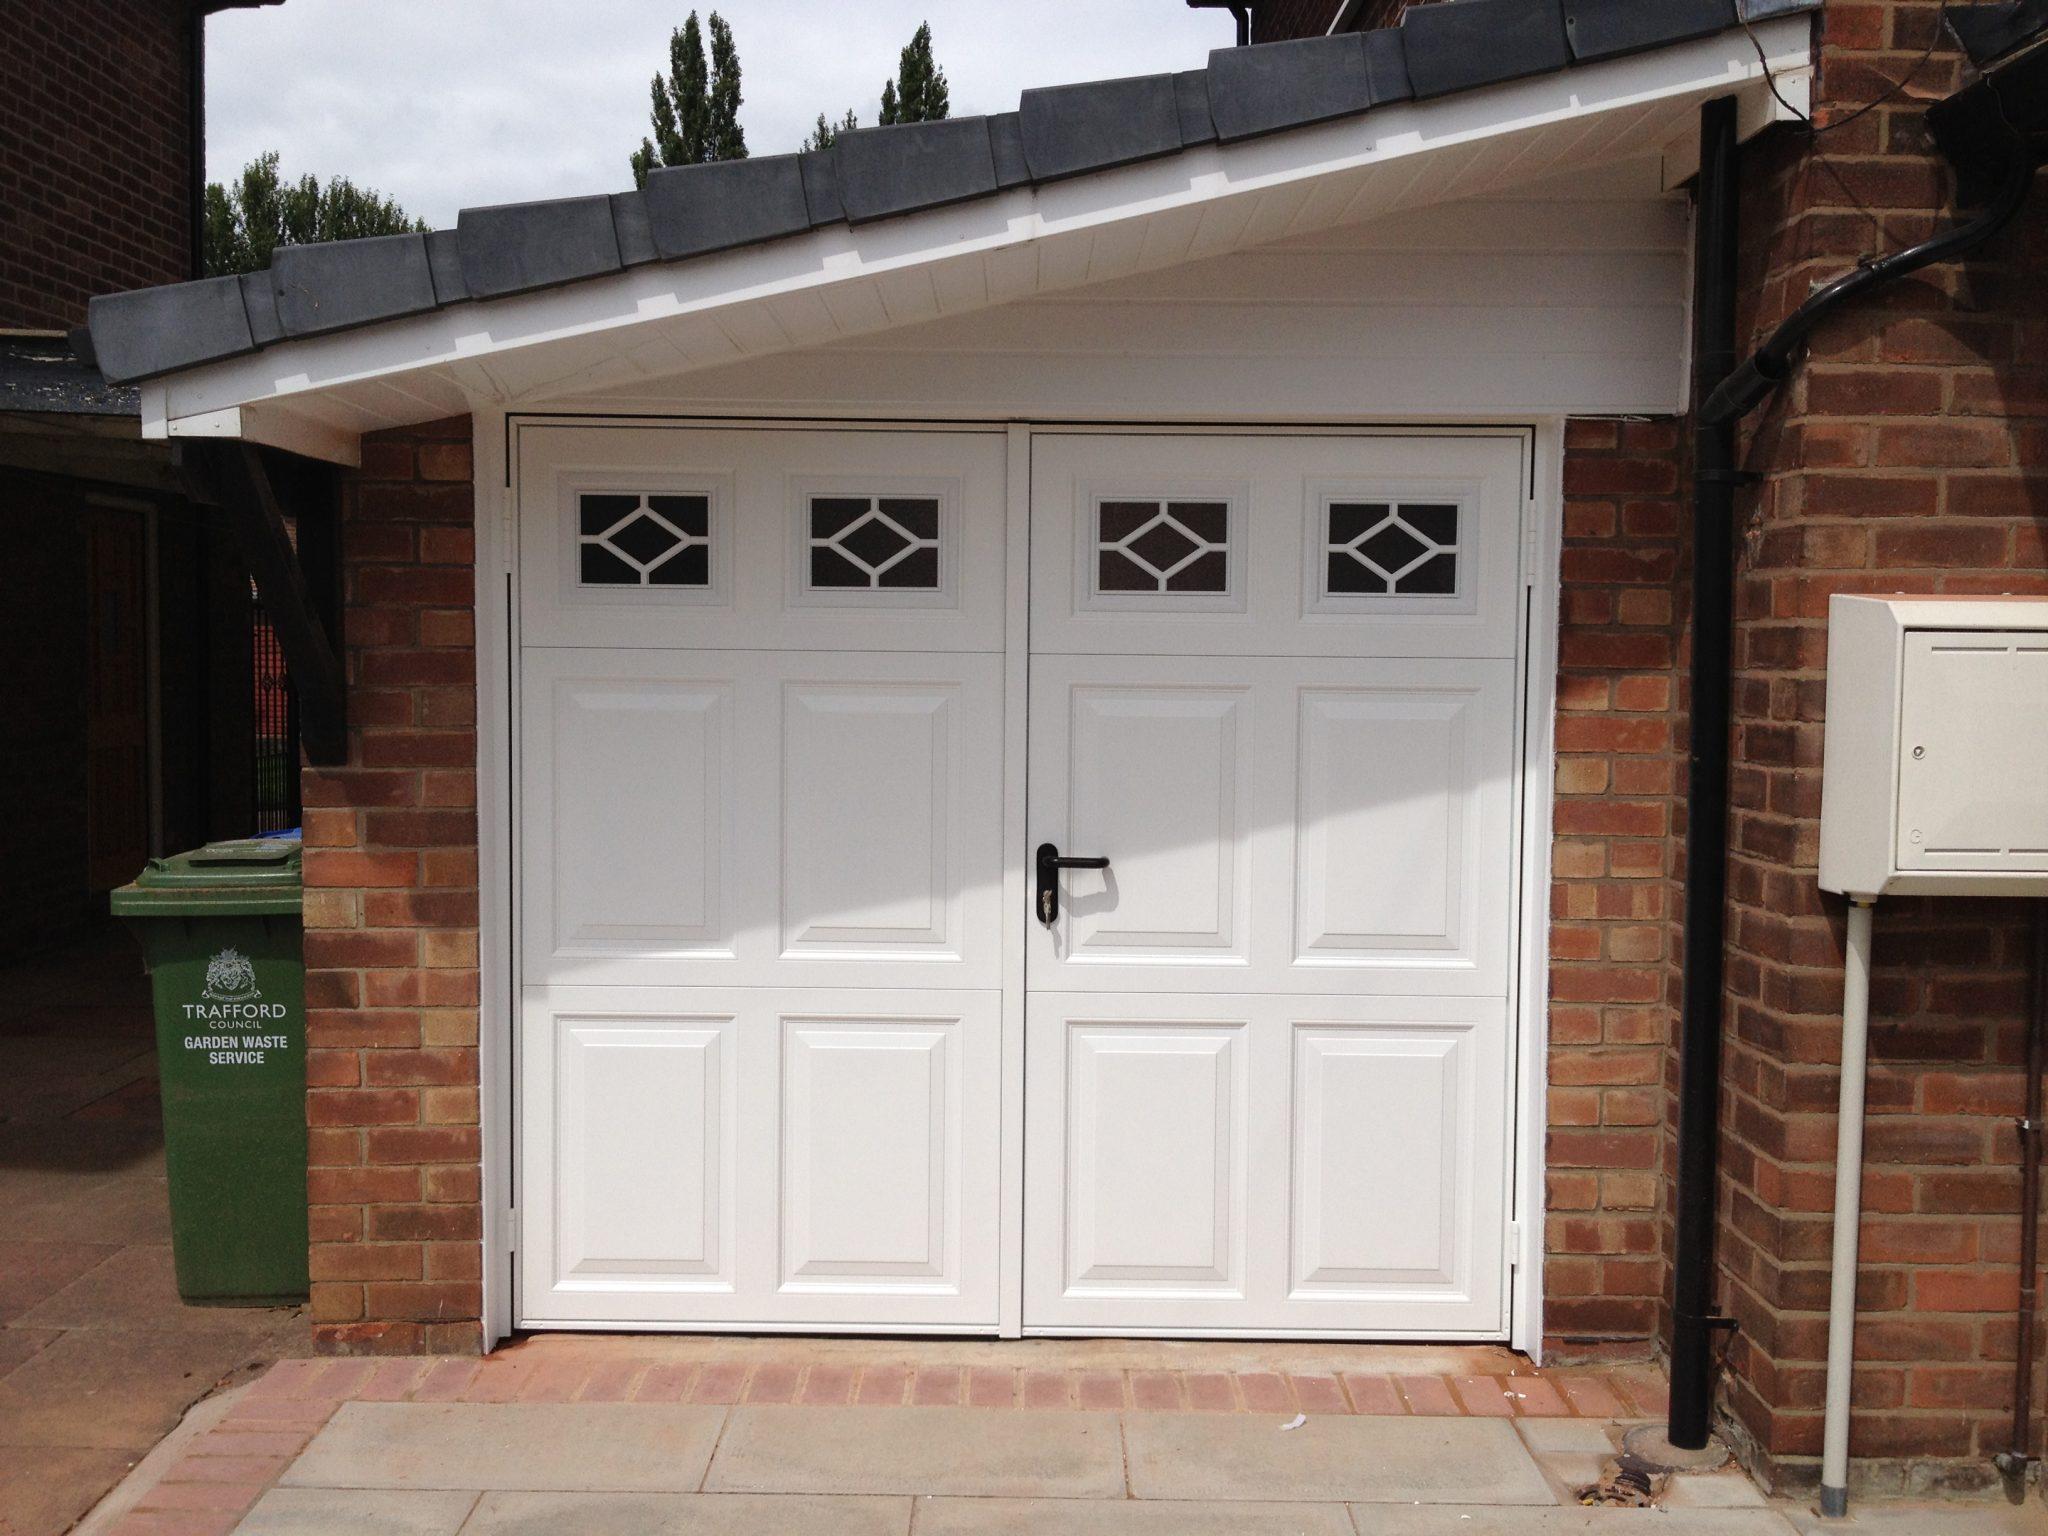 Garage Doors In Streford Repairs Installation